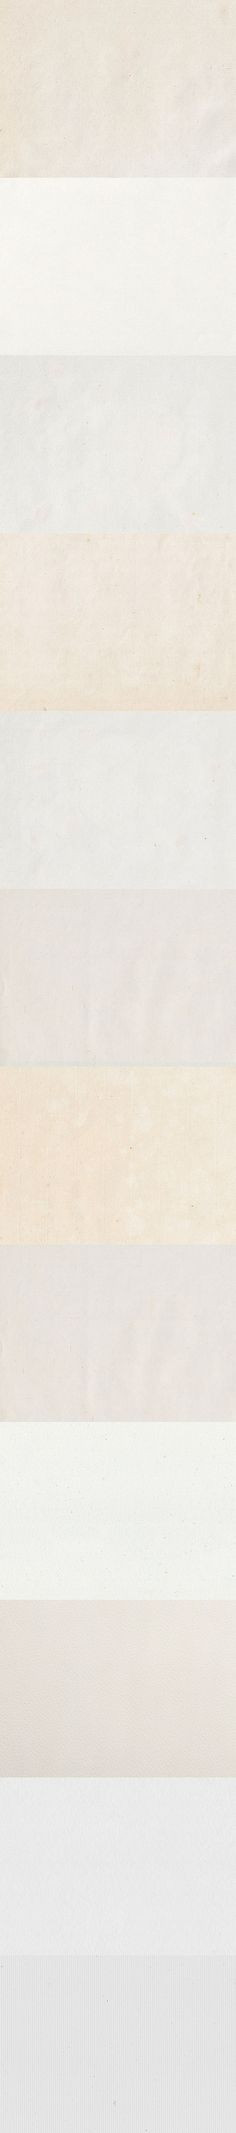 12 Paper Textures | GraphicBurger